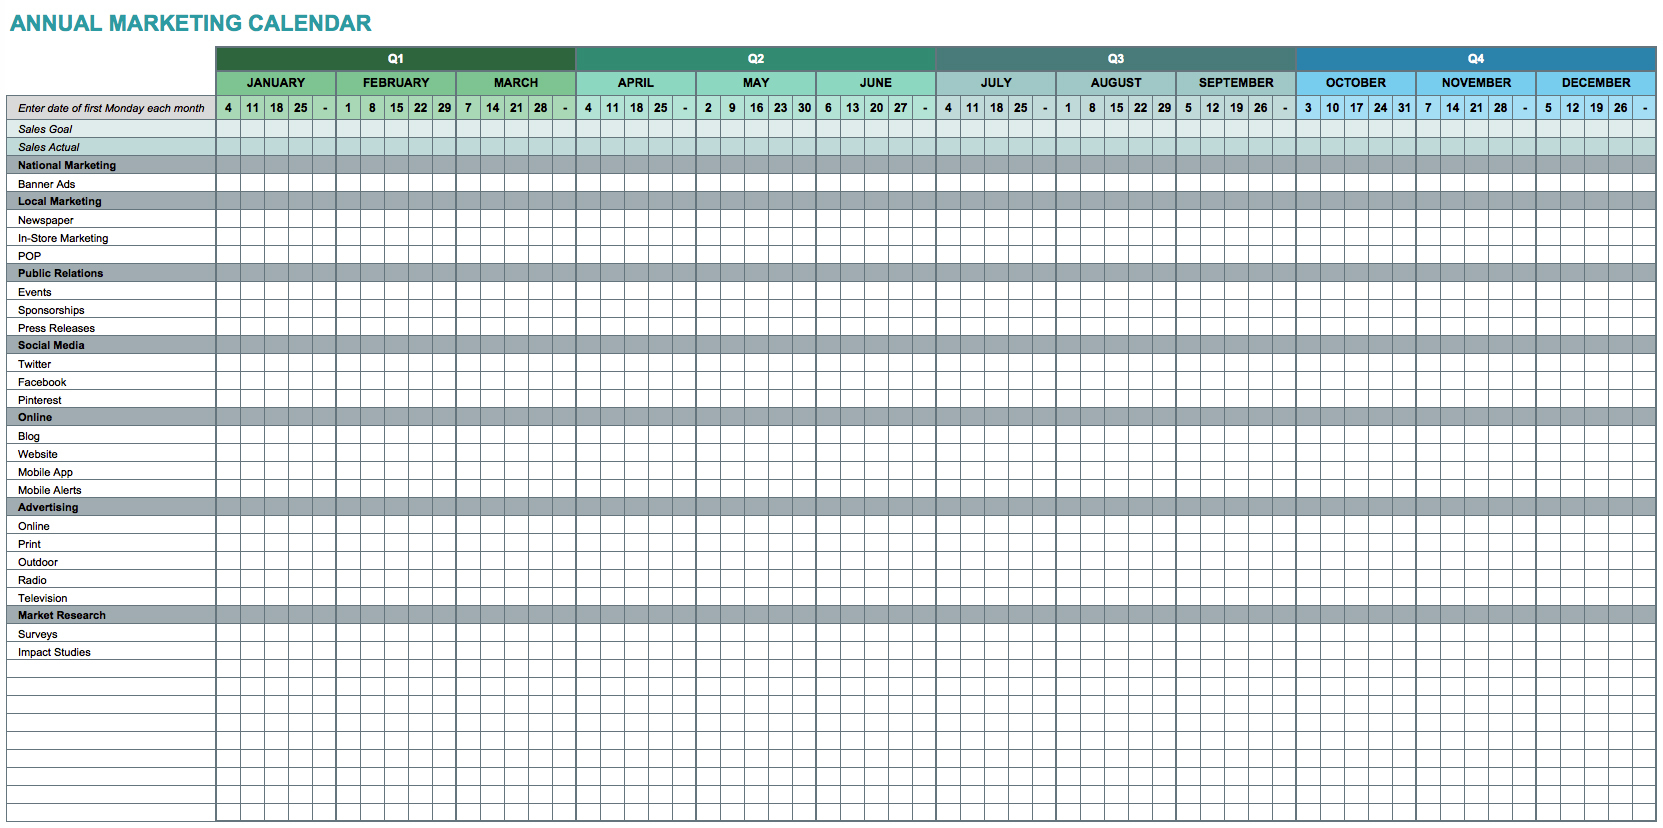 9 Free Marketing Calendar Templates For Excel - Smartsheet With Content Marketing Calendar Template